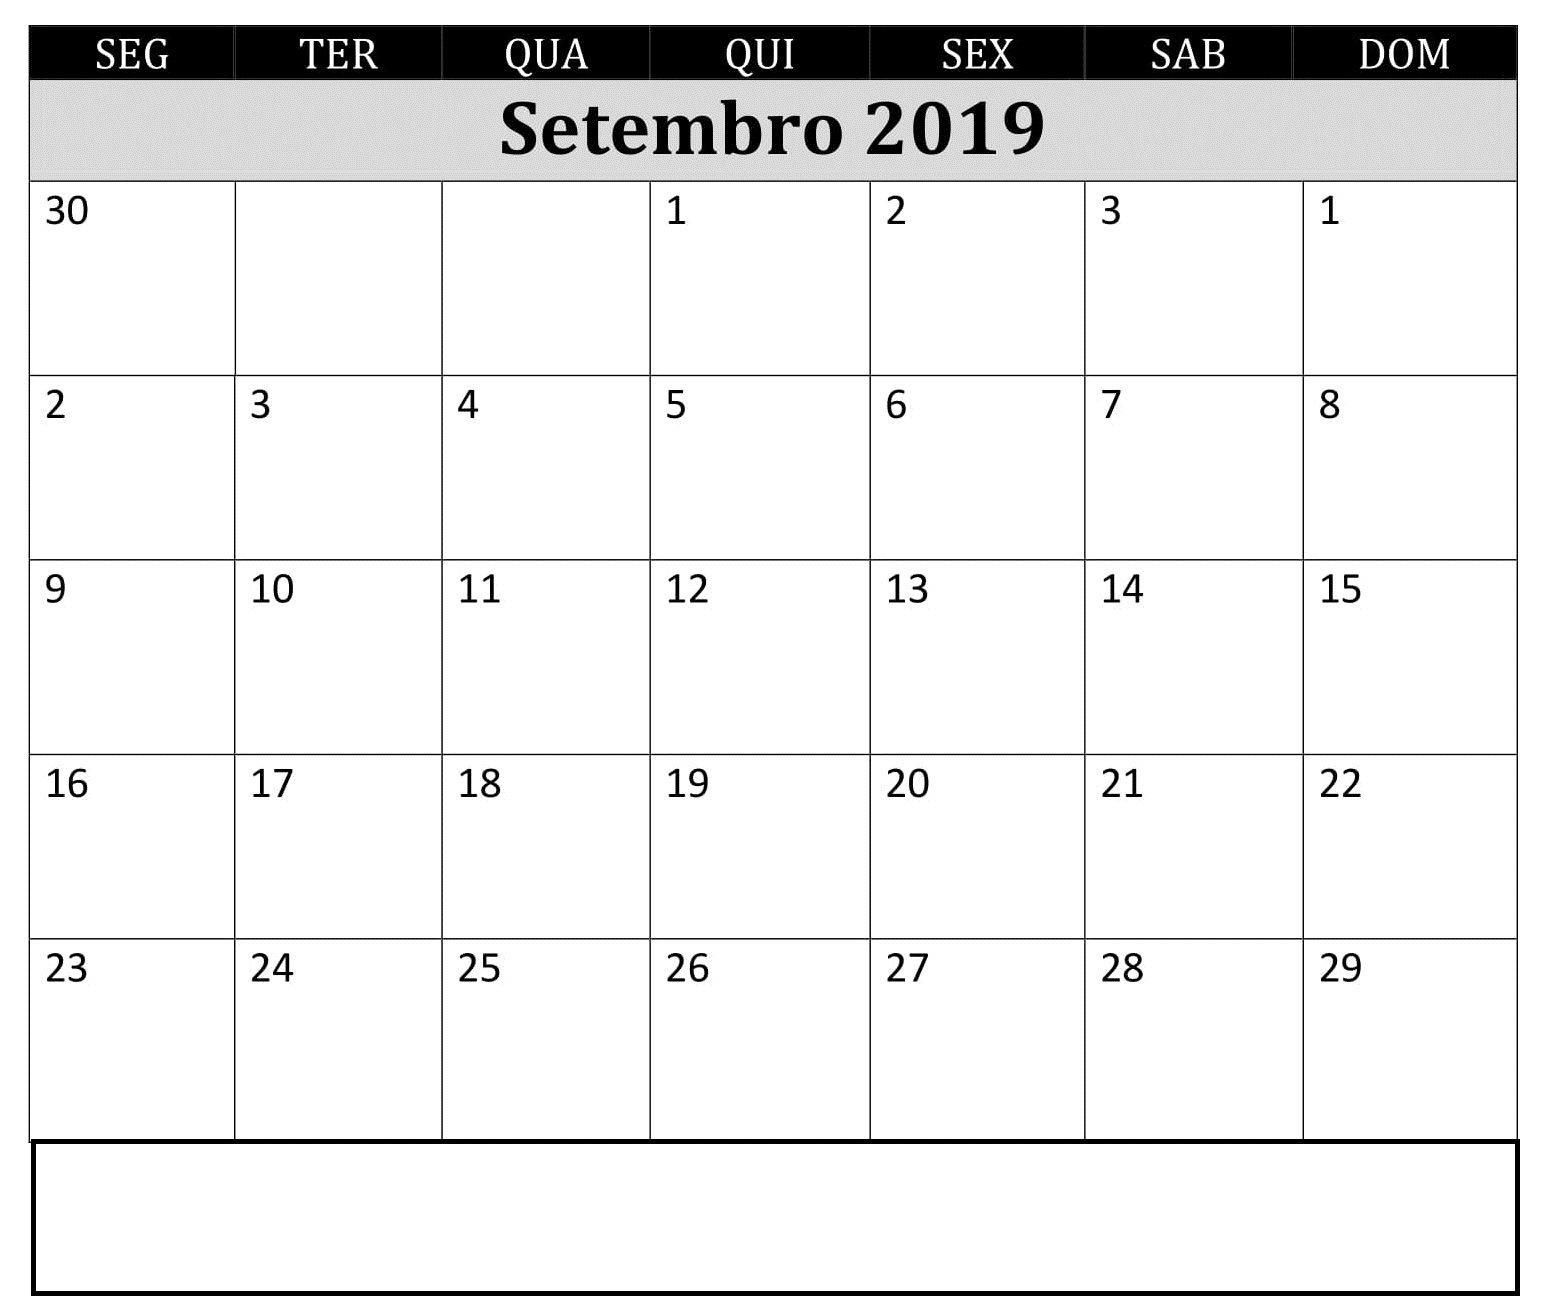 Imprimir Calendario De Marzo 2019 Más Caliente Editavel Calendário Setembro De 2019 Imprimir Of Imprimir Calendario De Marzo 2019 Más Recientes January Calendar 2019 with Holidays January2019 January